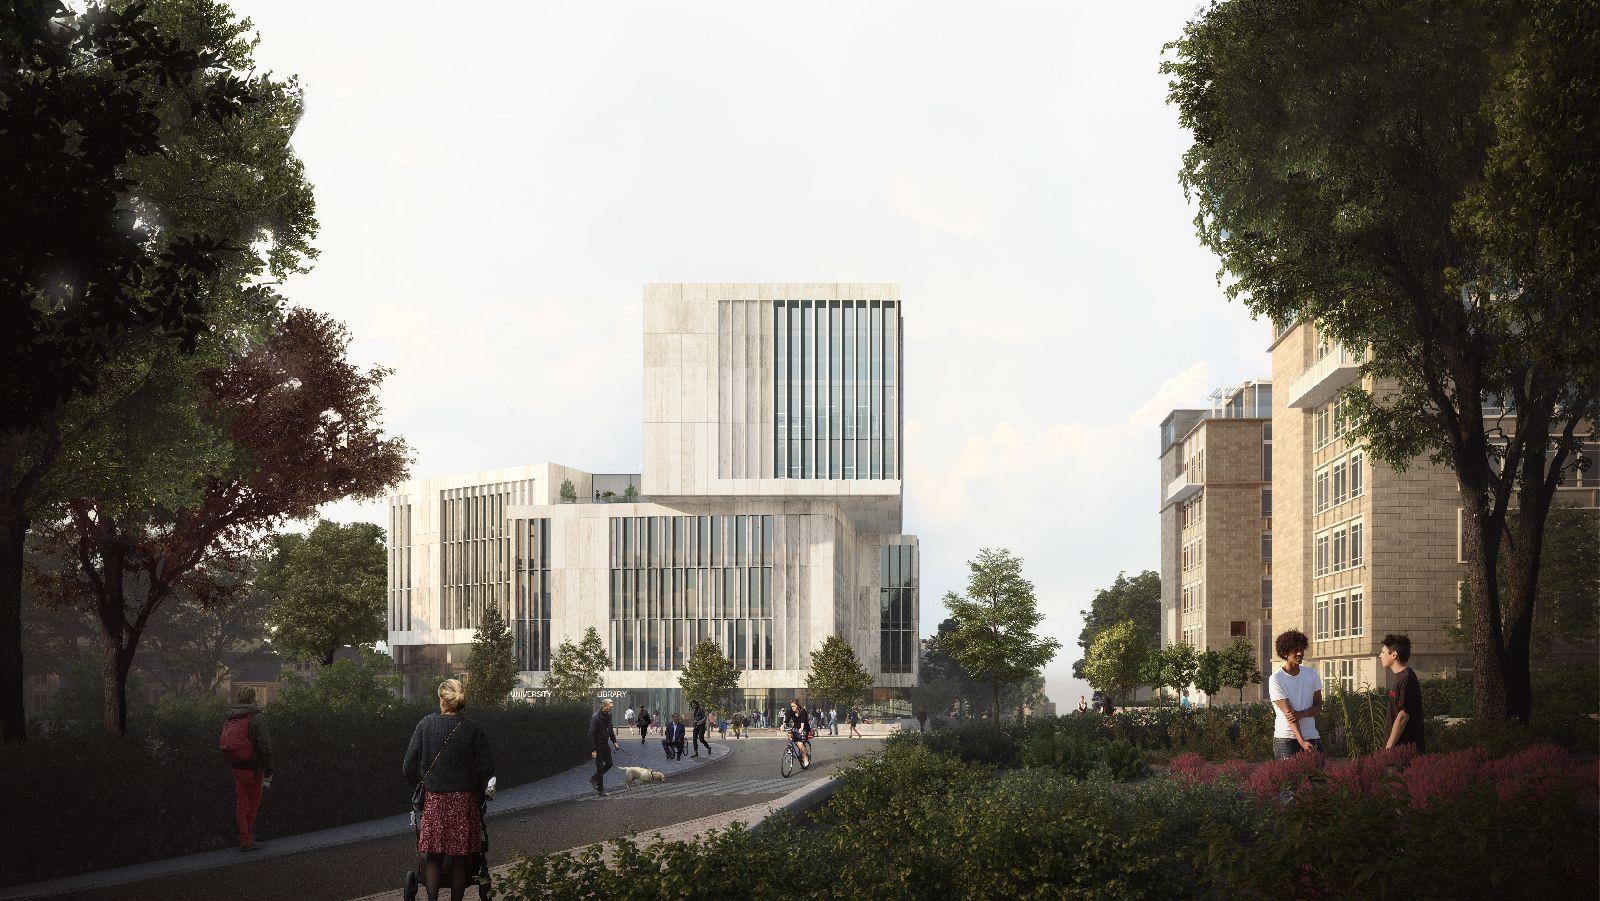 new University Library